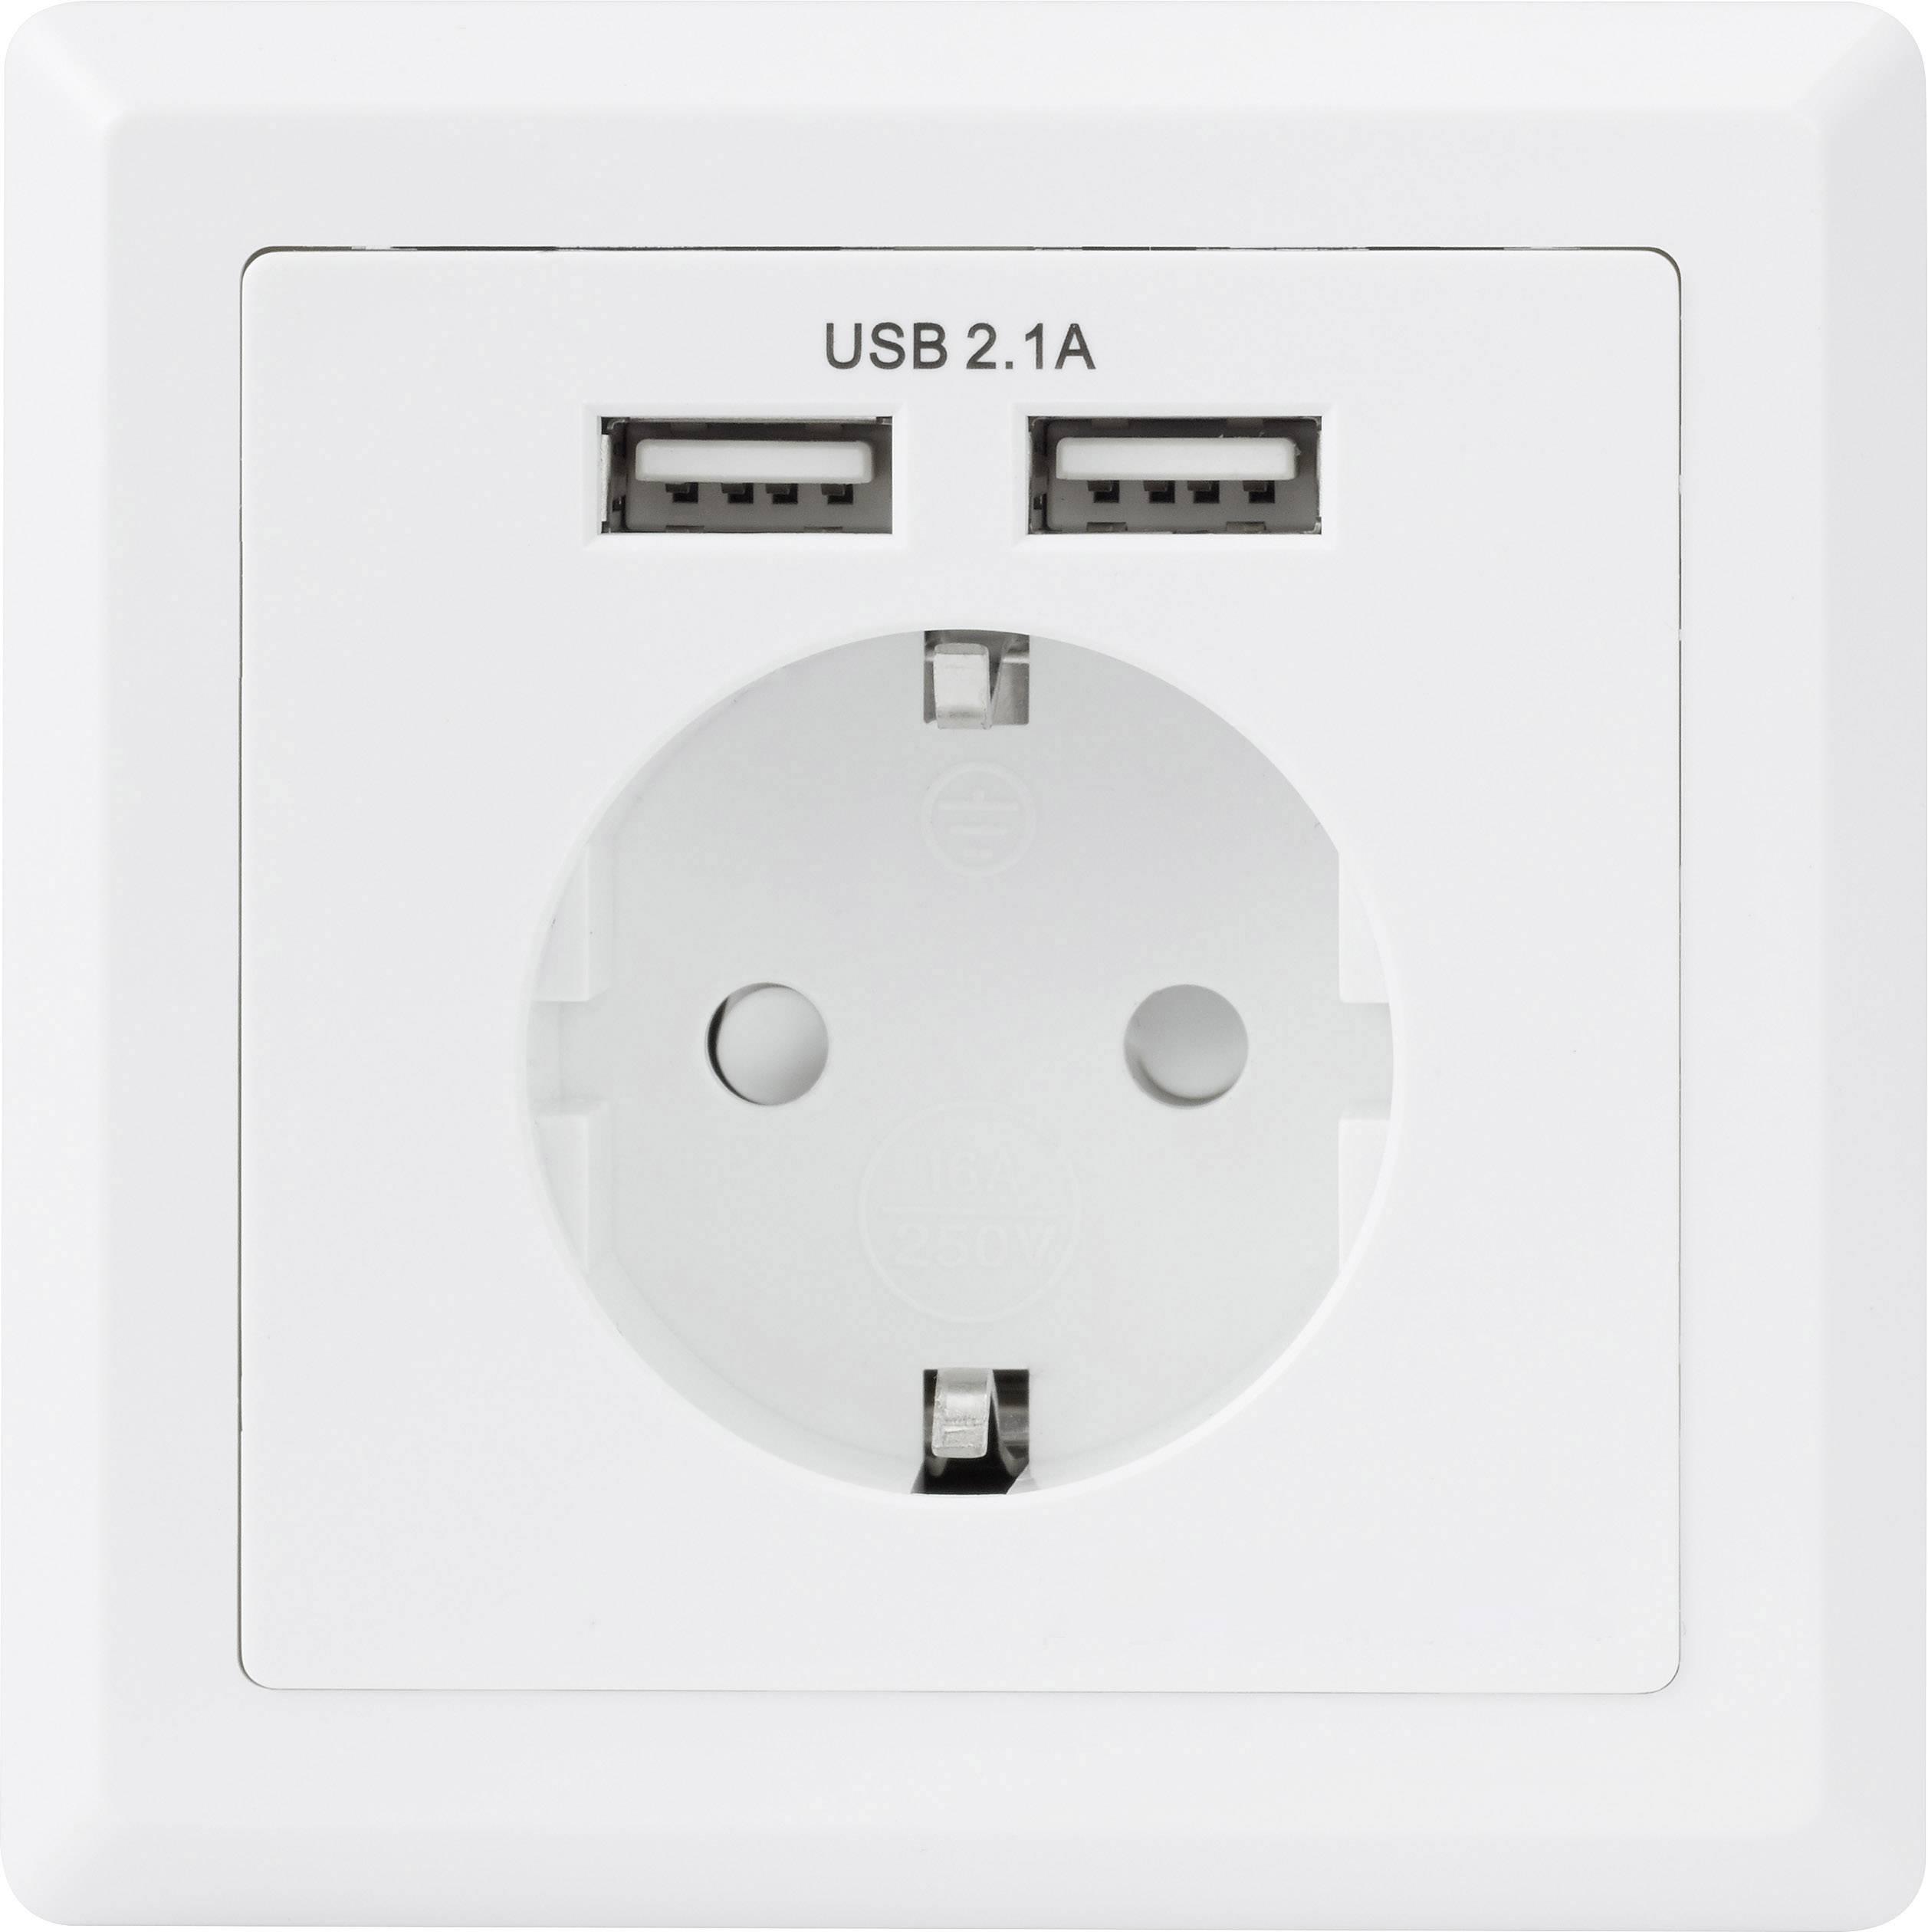 Nykomna Basetech 1425527 Eluttag Infälld USB-uttag IP20 Vit | Conrad.se KI-66